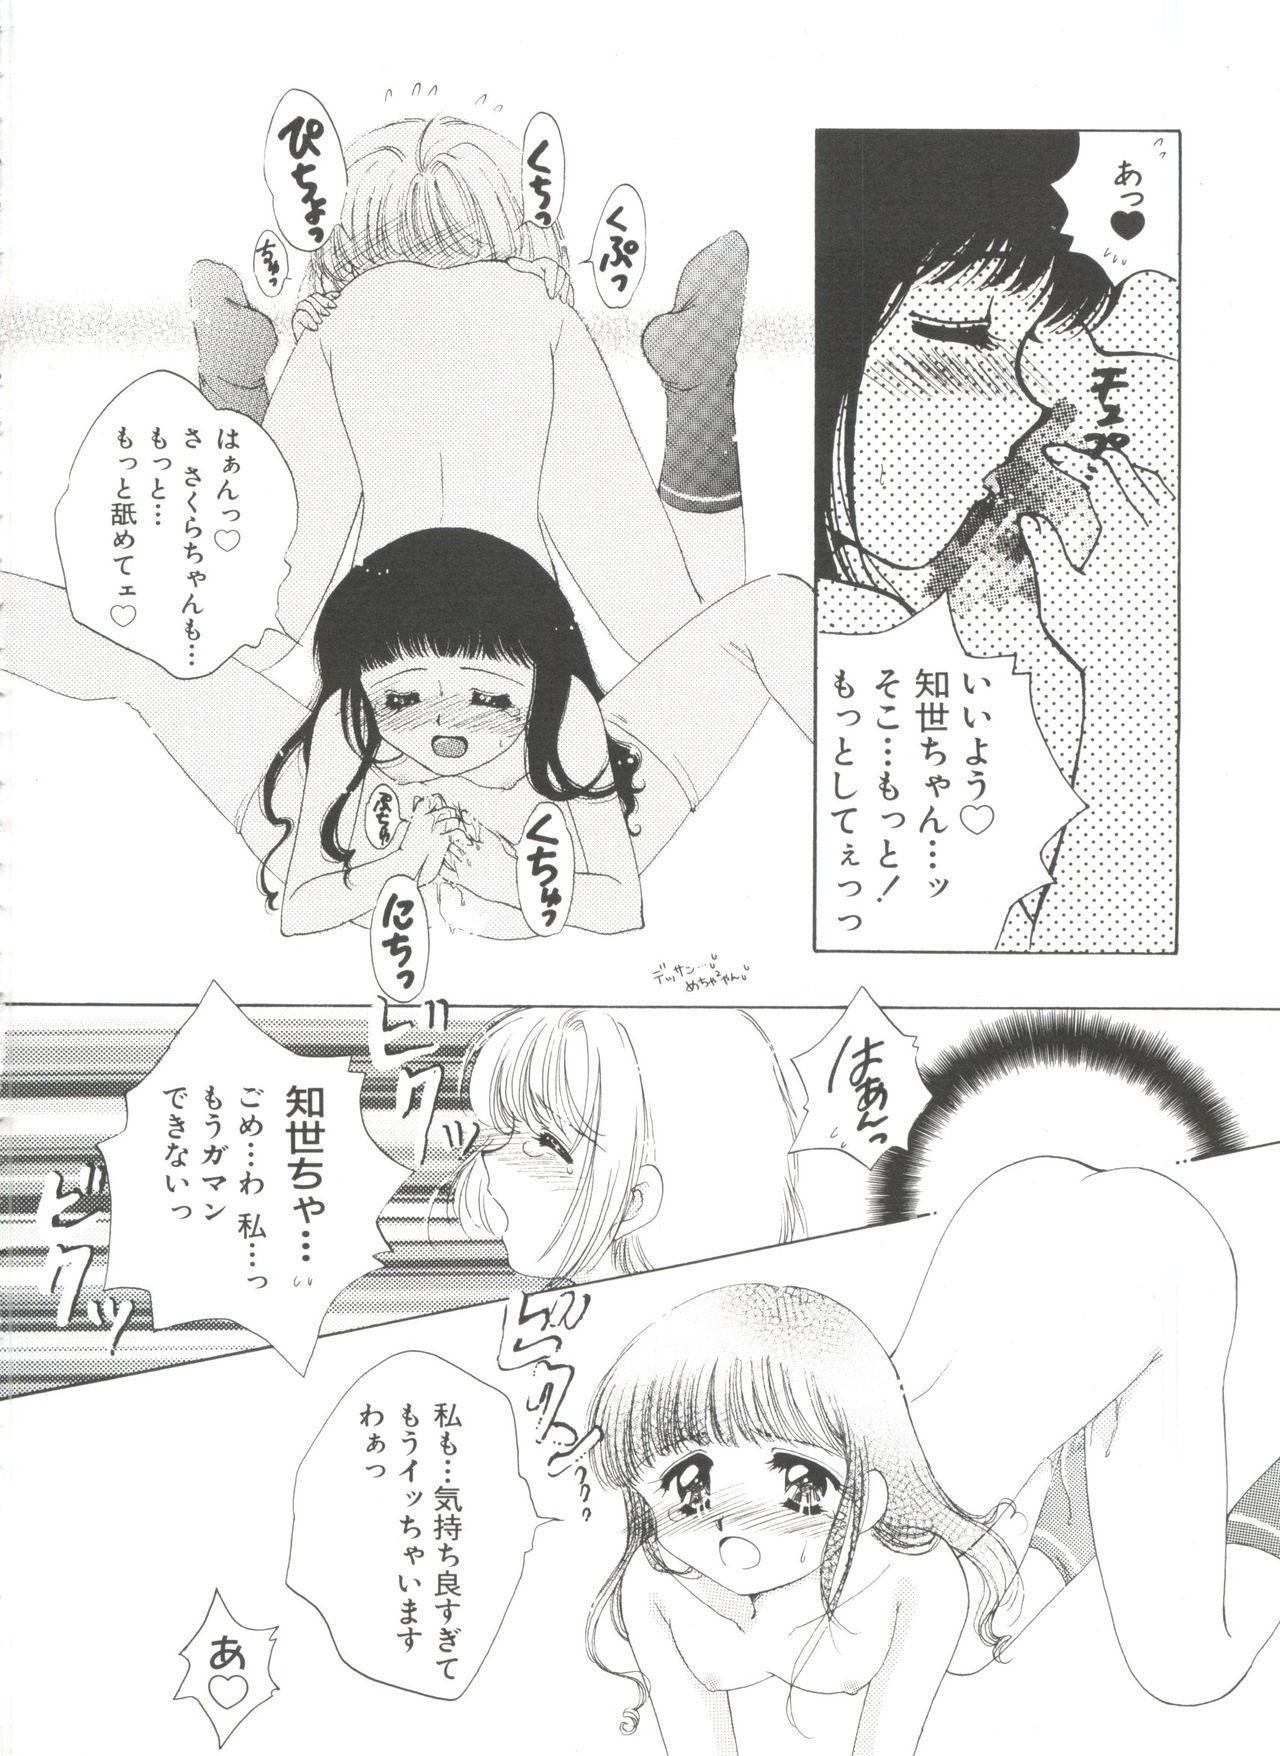 Ero-chan to Issho 3 127